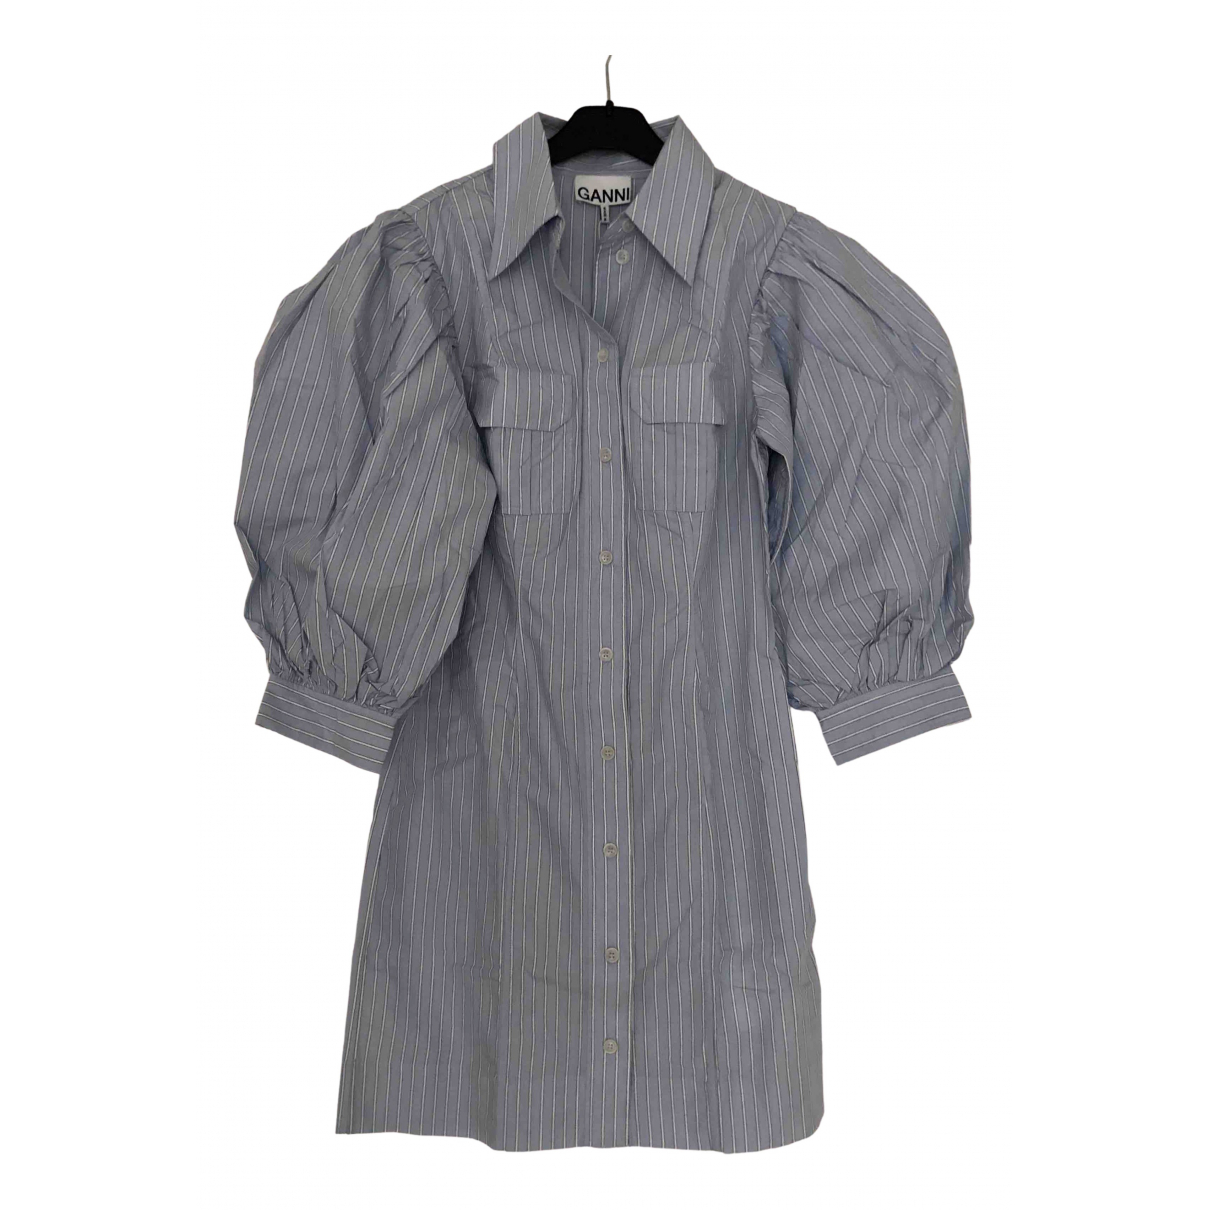 Ganni Spring Summer 2020 Kleid in  Blau Baumwolle